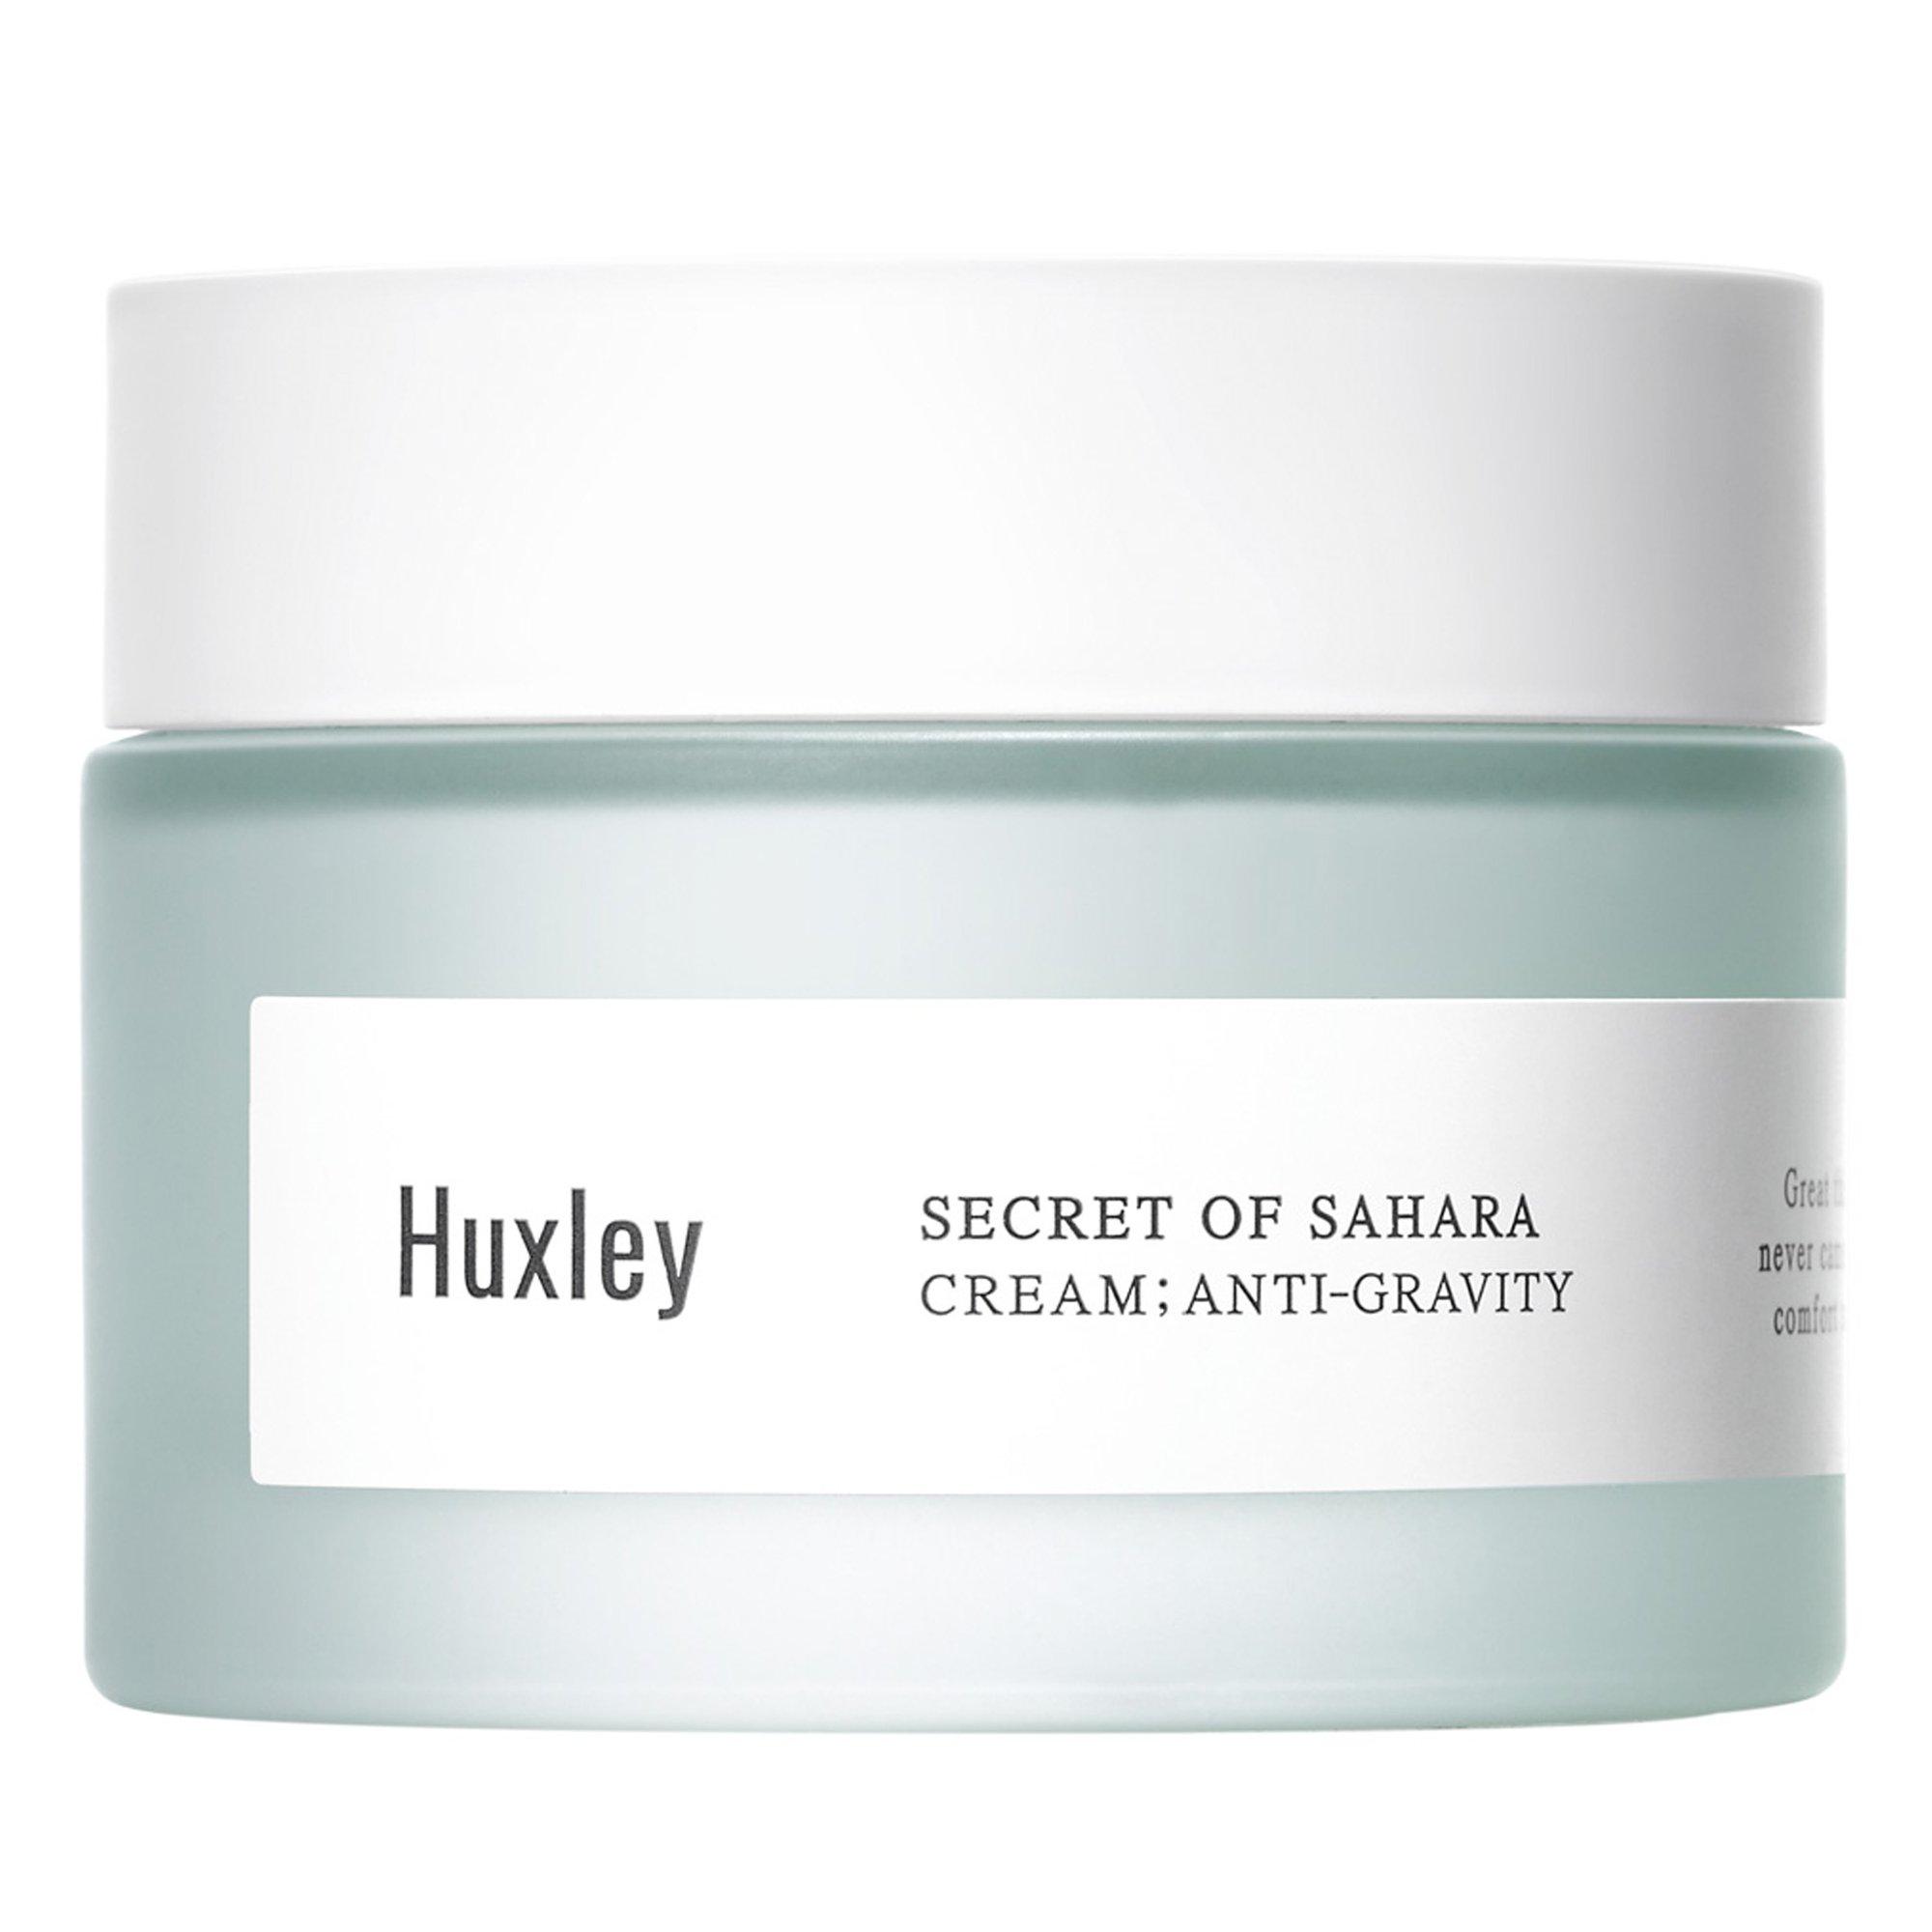 Huxley Secret Of Sahara Cream; Anti-Gravity